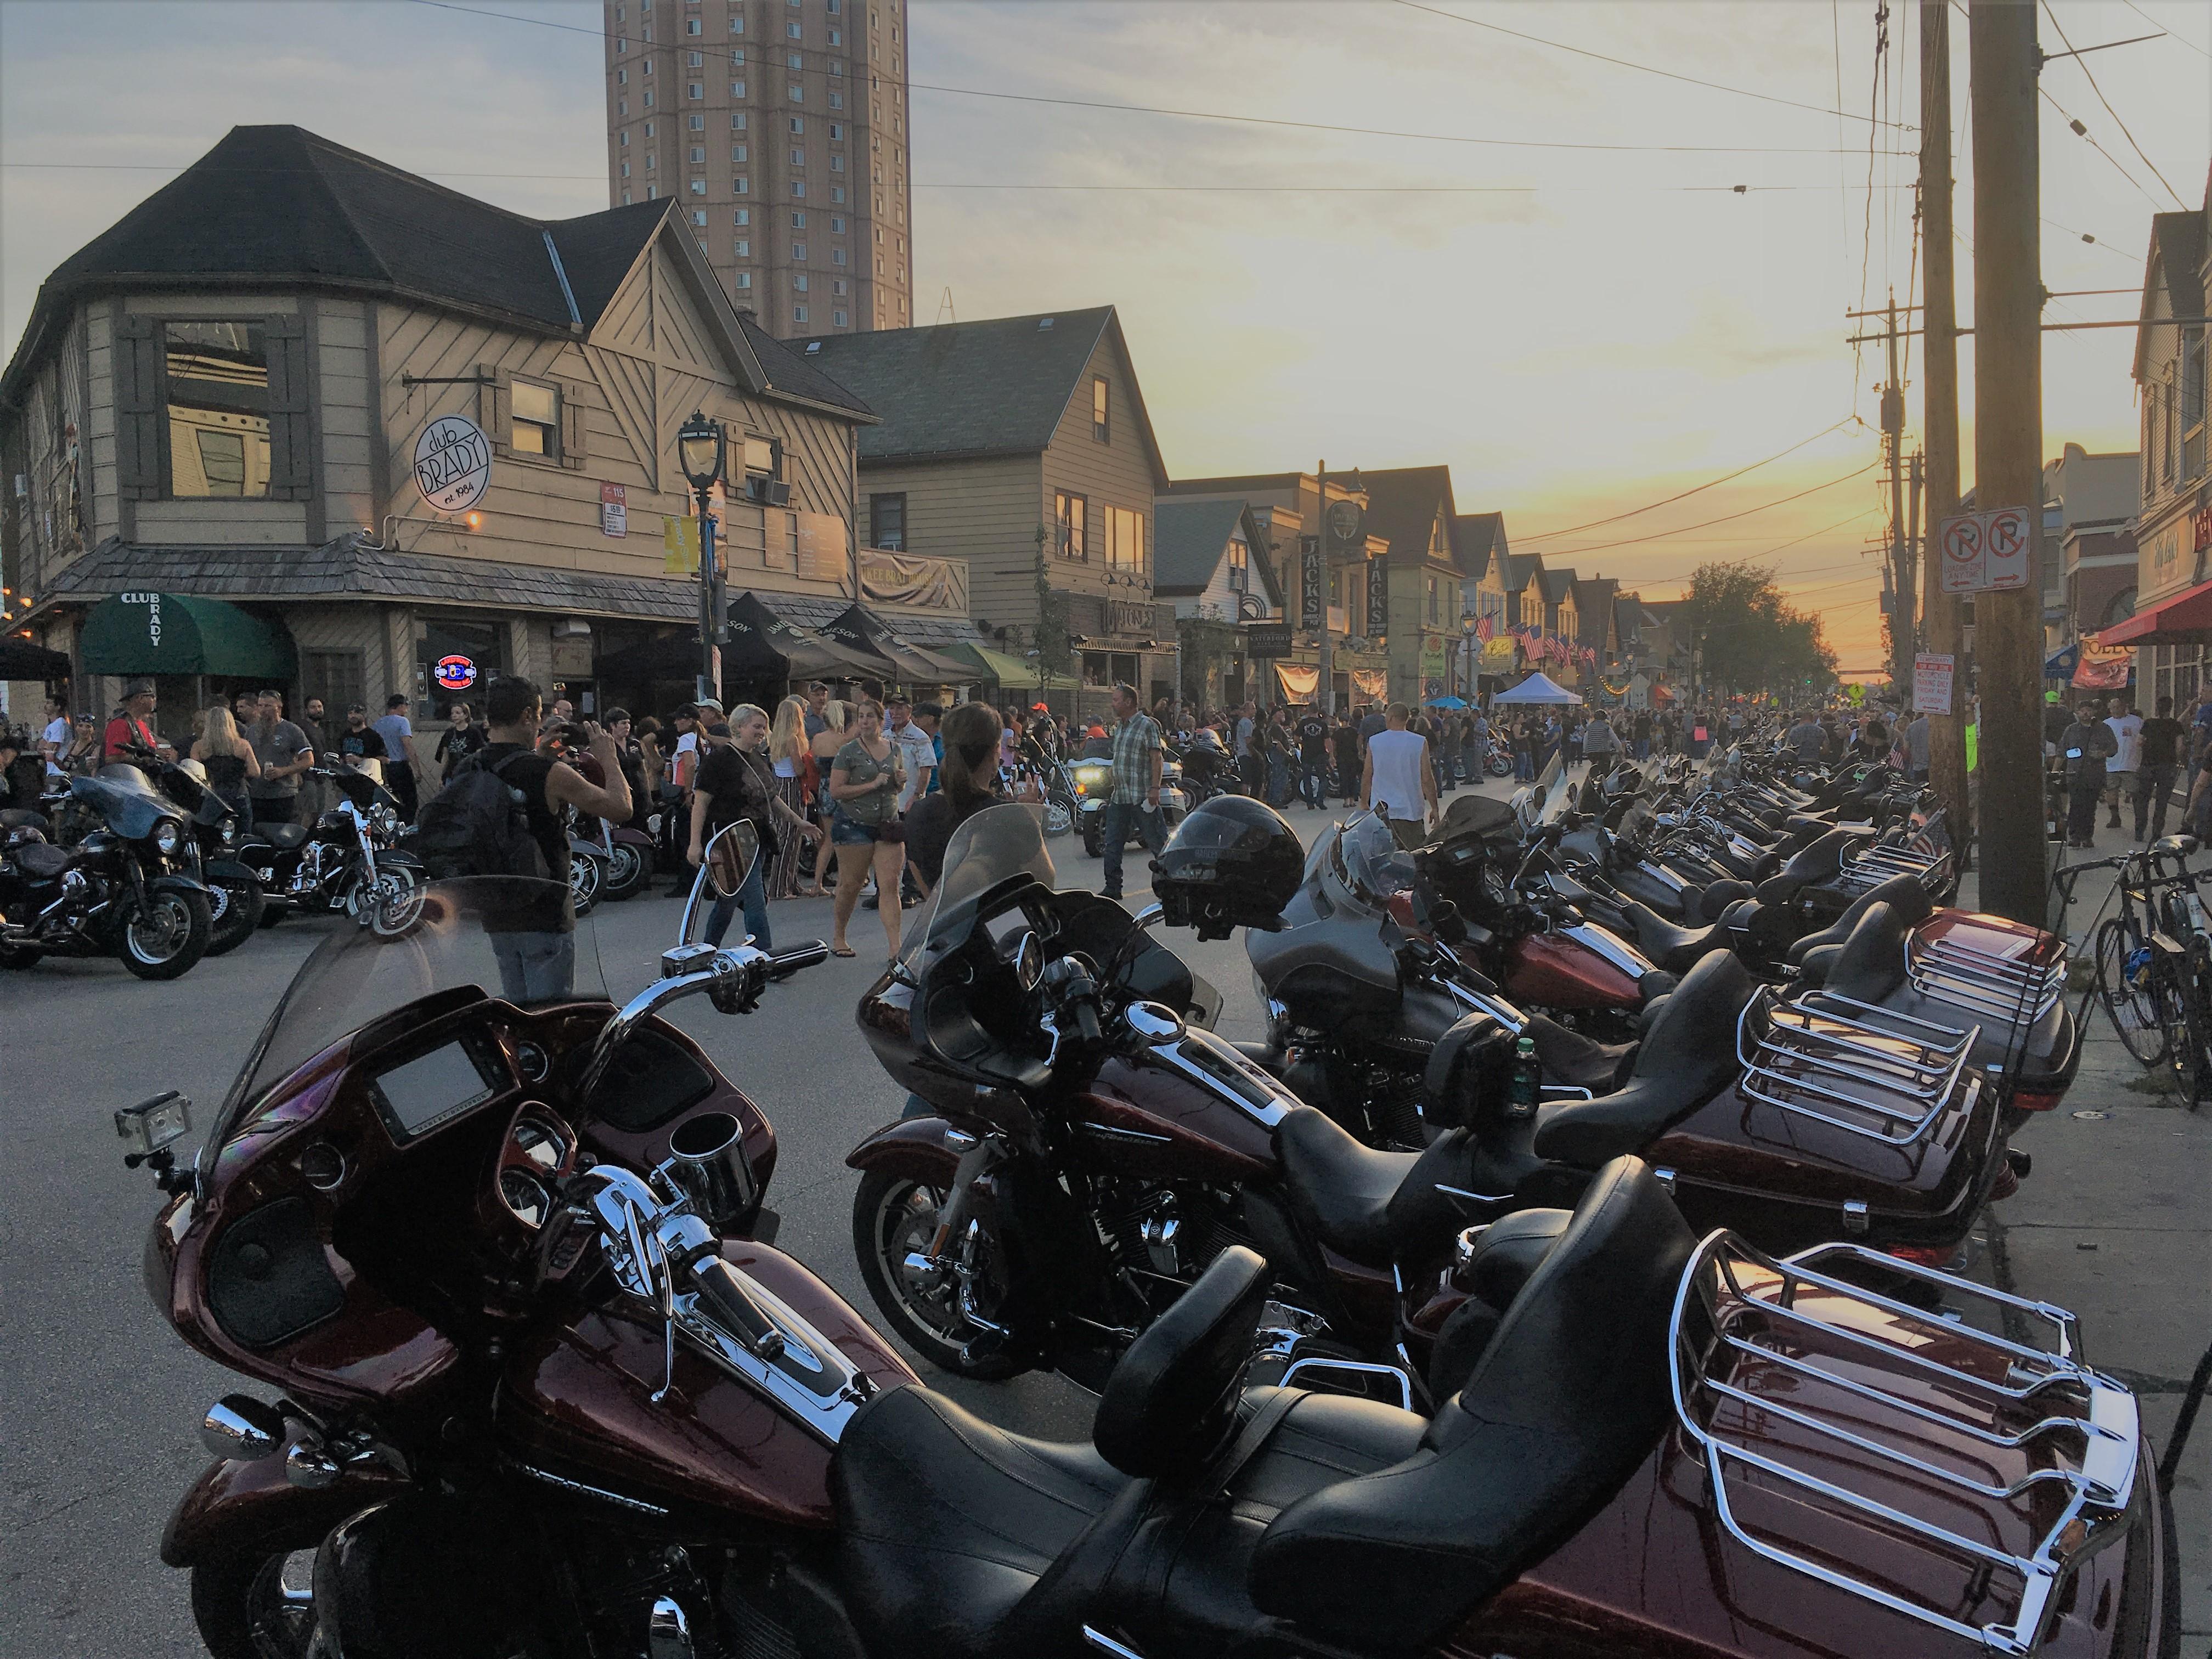 d5c95fb04855 Harley Riders Oppose Boycott of Company » Urban Milwaukee